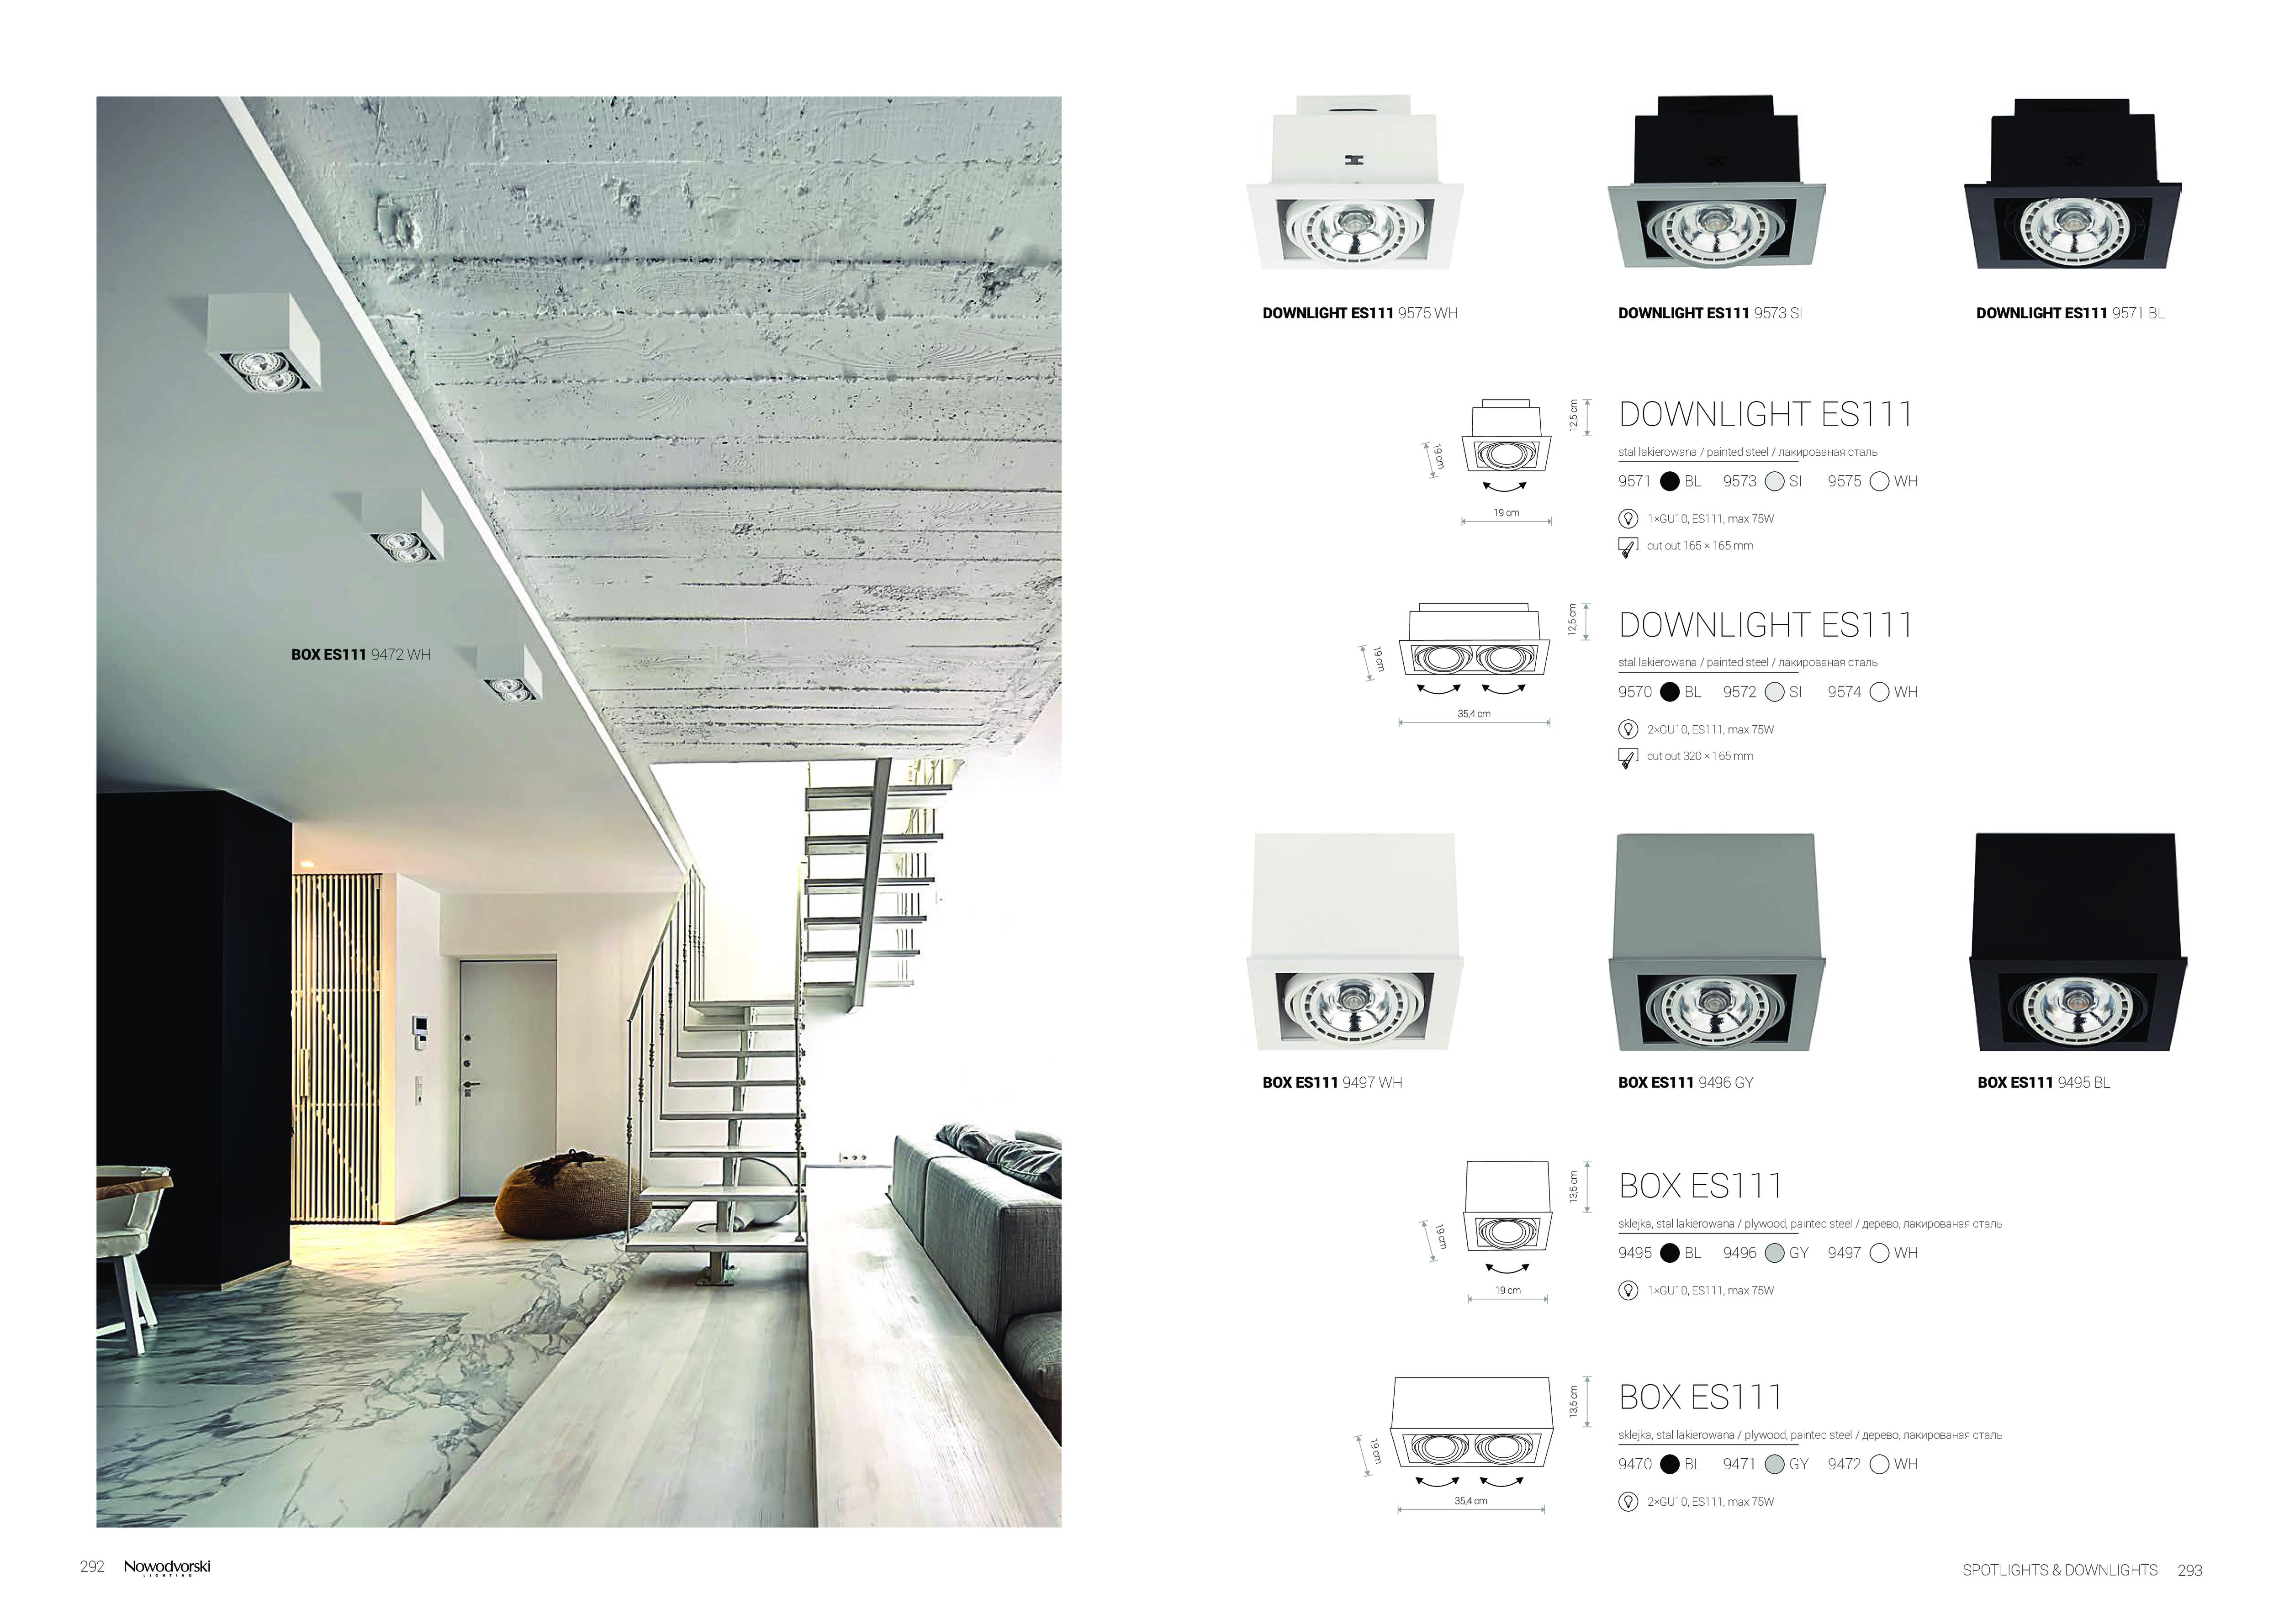 Потолочный светильник Nowodvorski Box 9472, 2xGU10x75W, белый, дерево, металл - фото 2